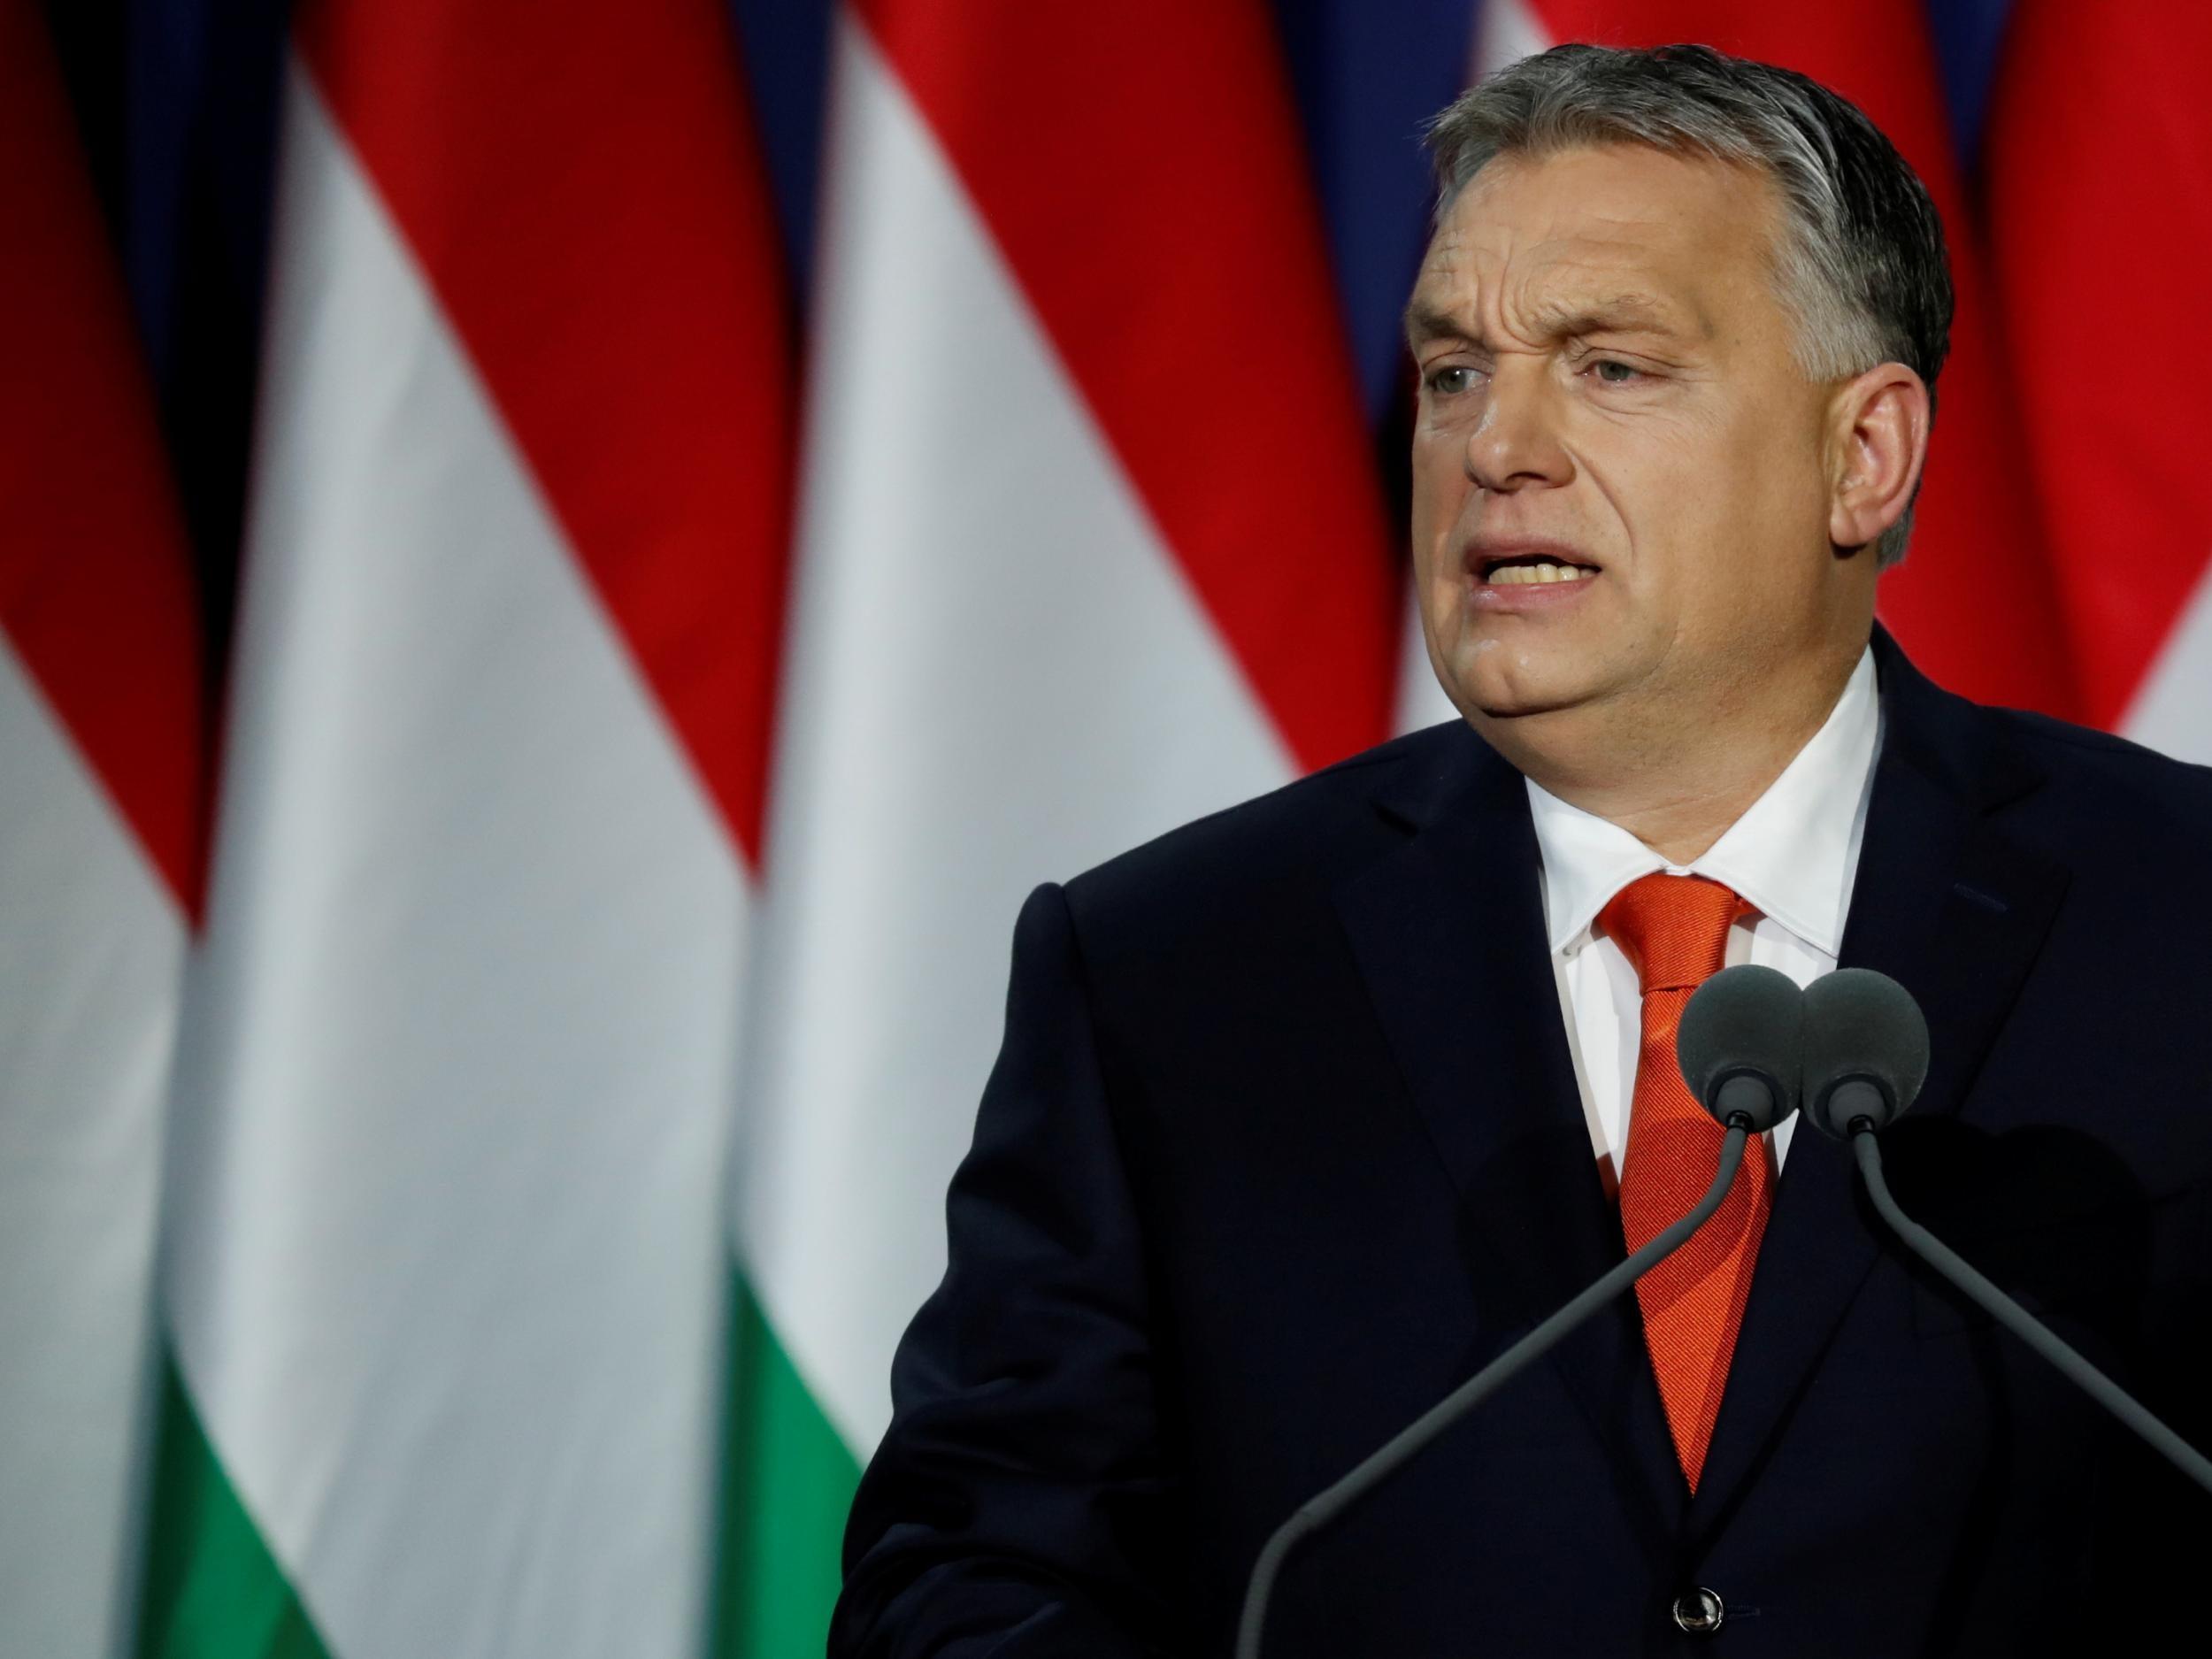 'Europe is being overrun': Hungarian leader Viktor Orban steps up anti-immigrant populist rhetoric ahead of elections